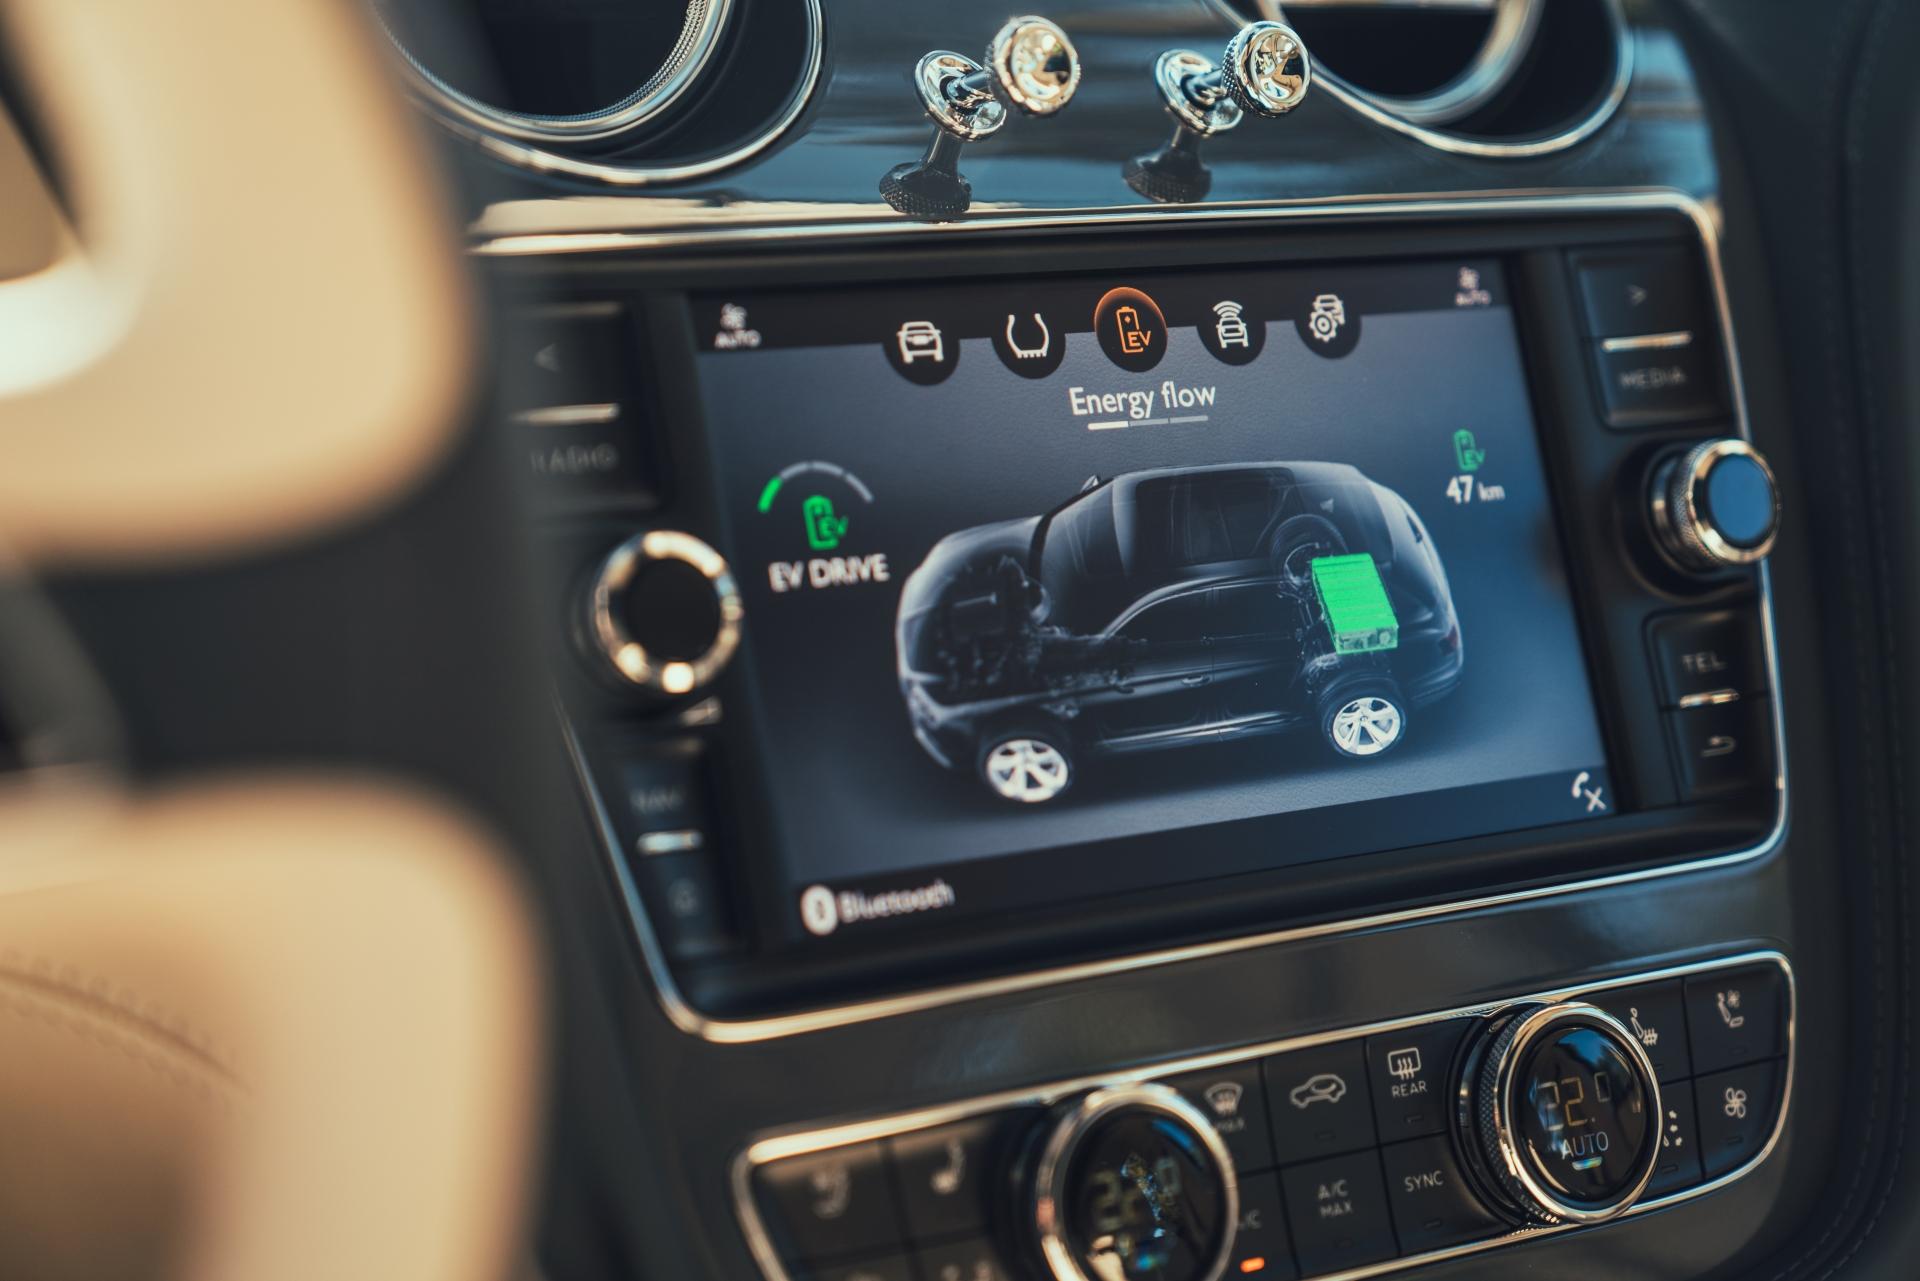 2019 Bentley Bentayga Hybrid - Infotainment Screen